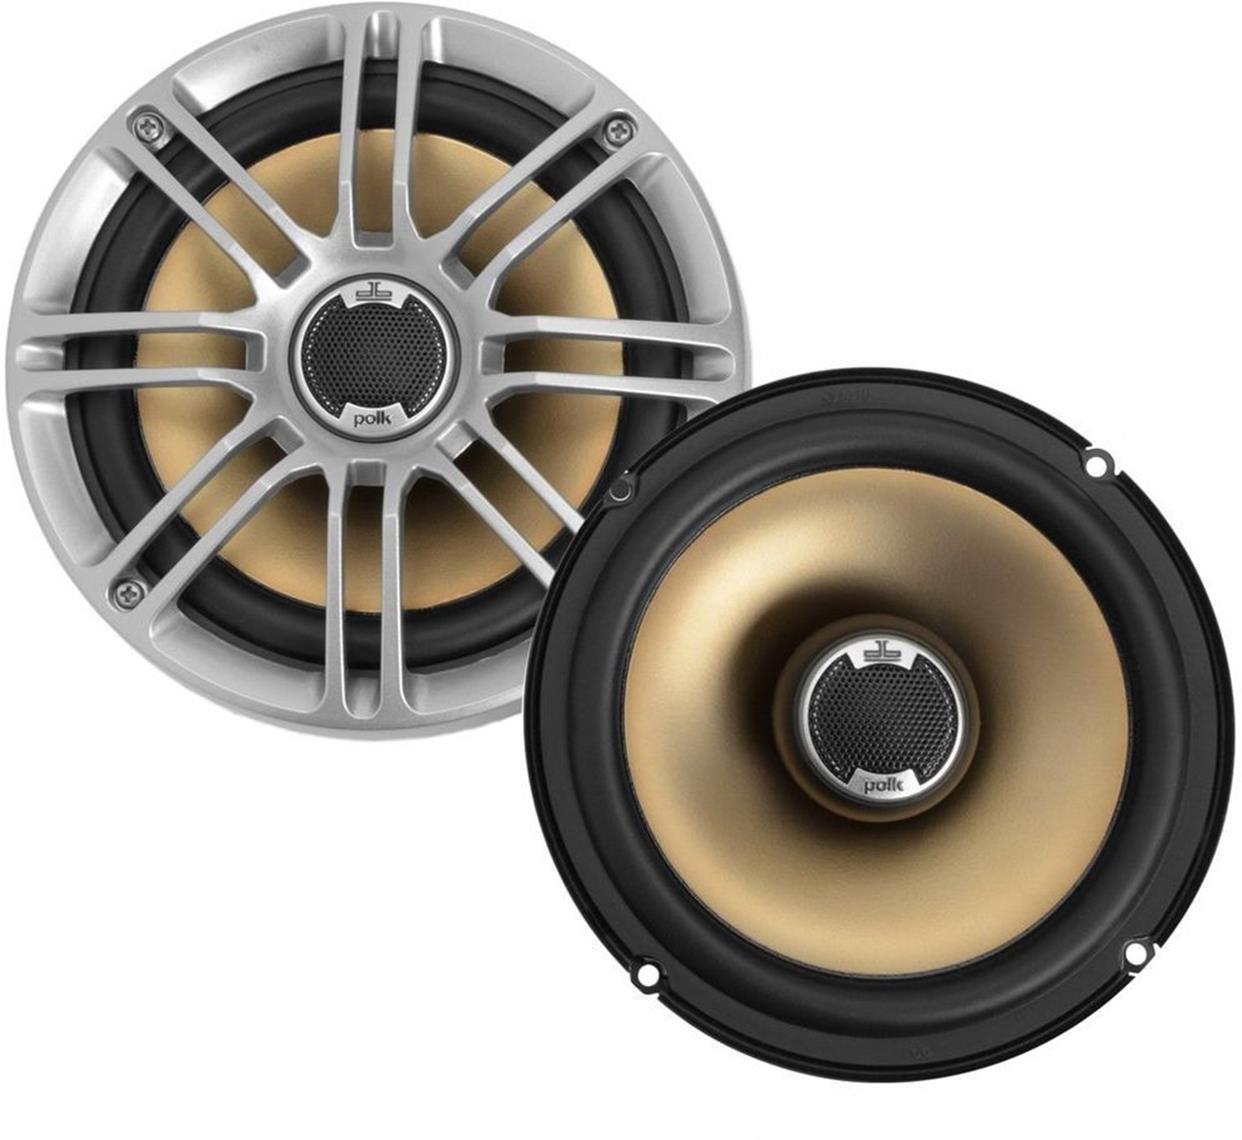 Polk Audio Db651 65 675 2 Way Marine Certified Db Drive Amp Wiring Diagram Series Car Speakers With Liquid Cooled Silk Tweeters Electronics